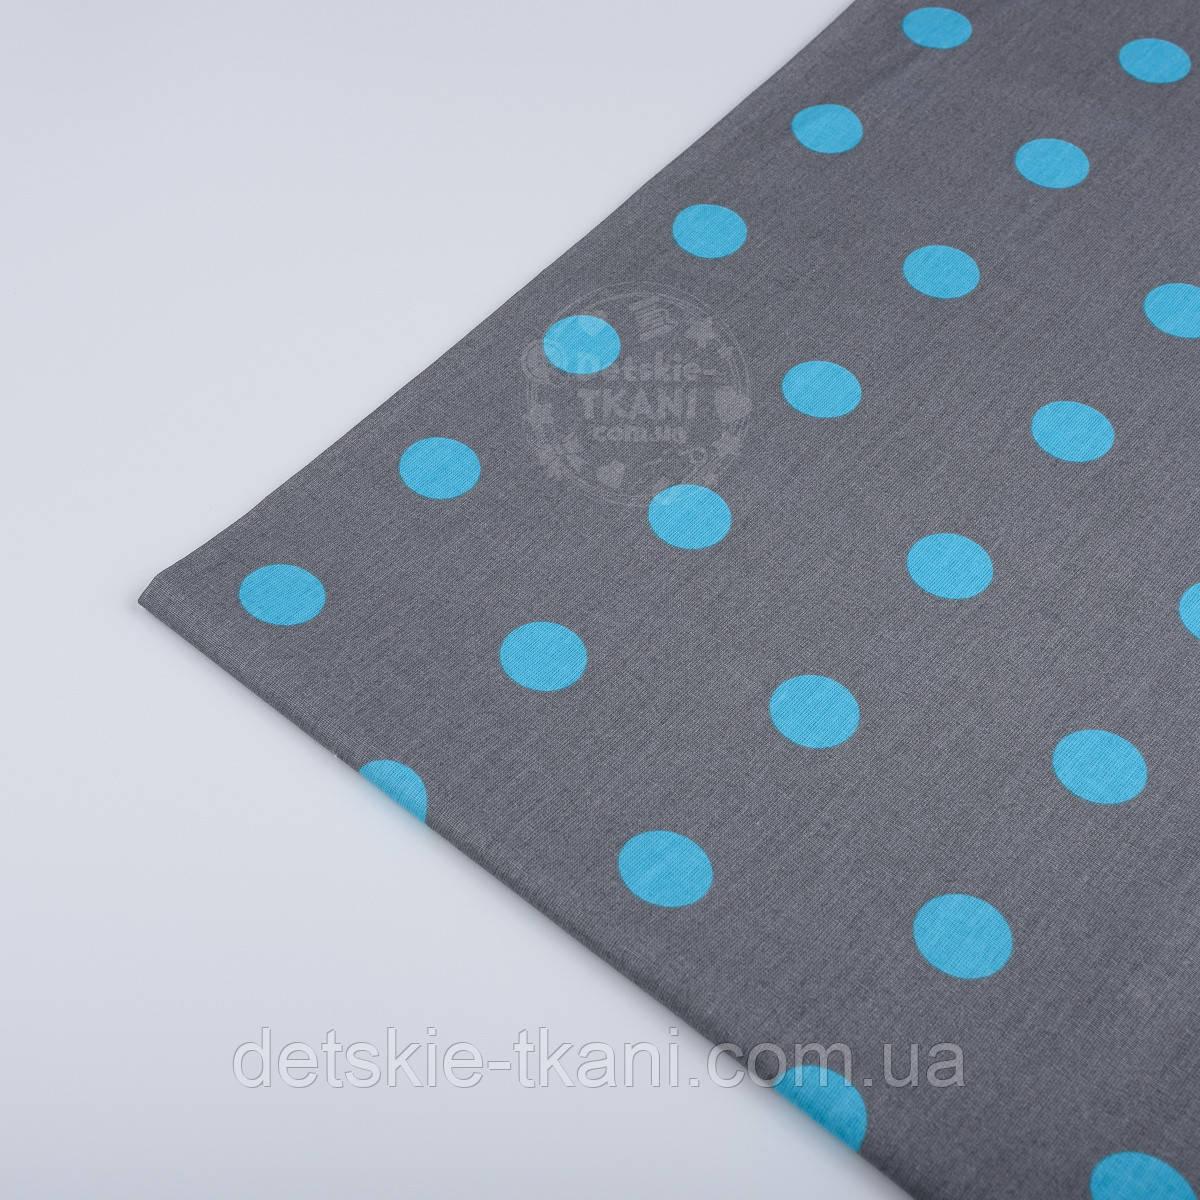 Лоскут ткани №730 размером 45*80 см